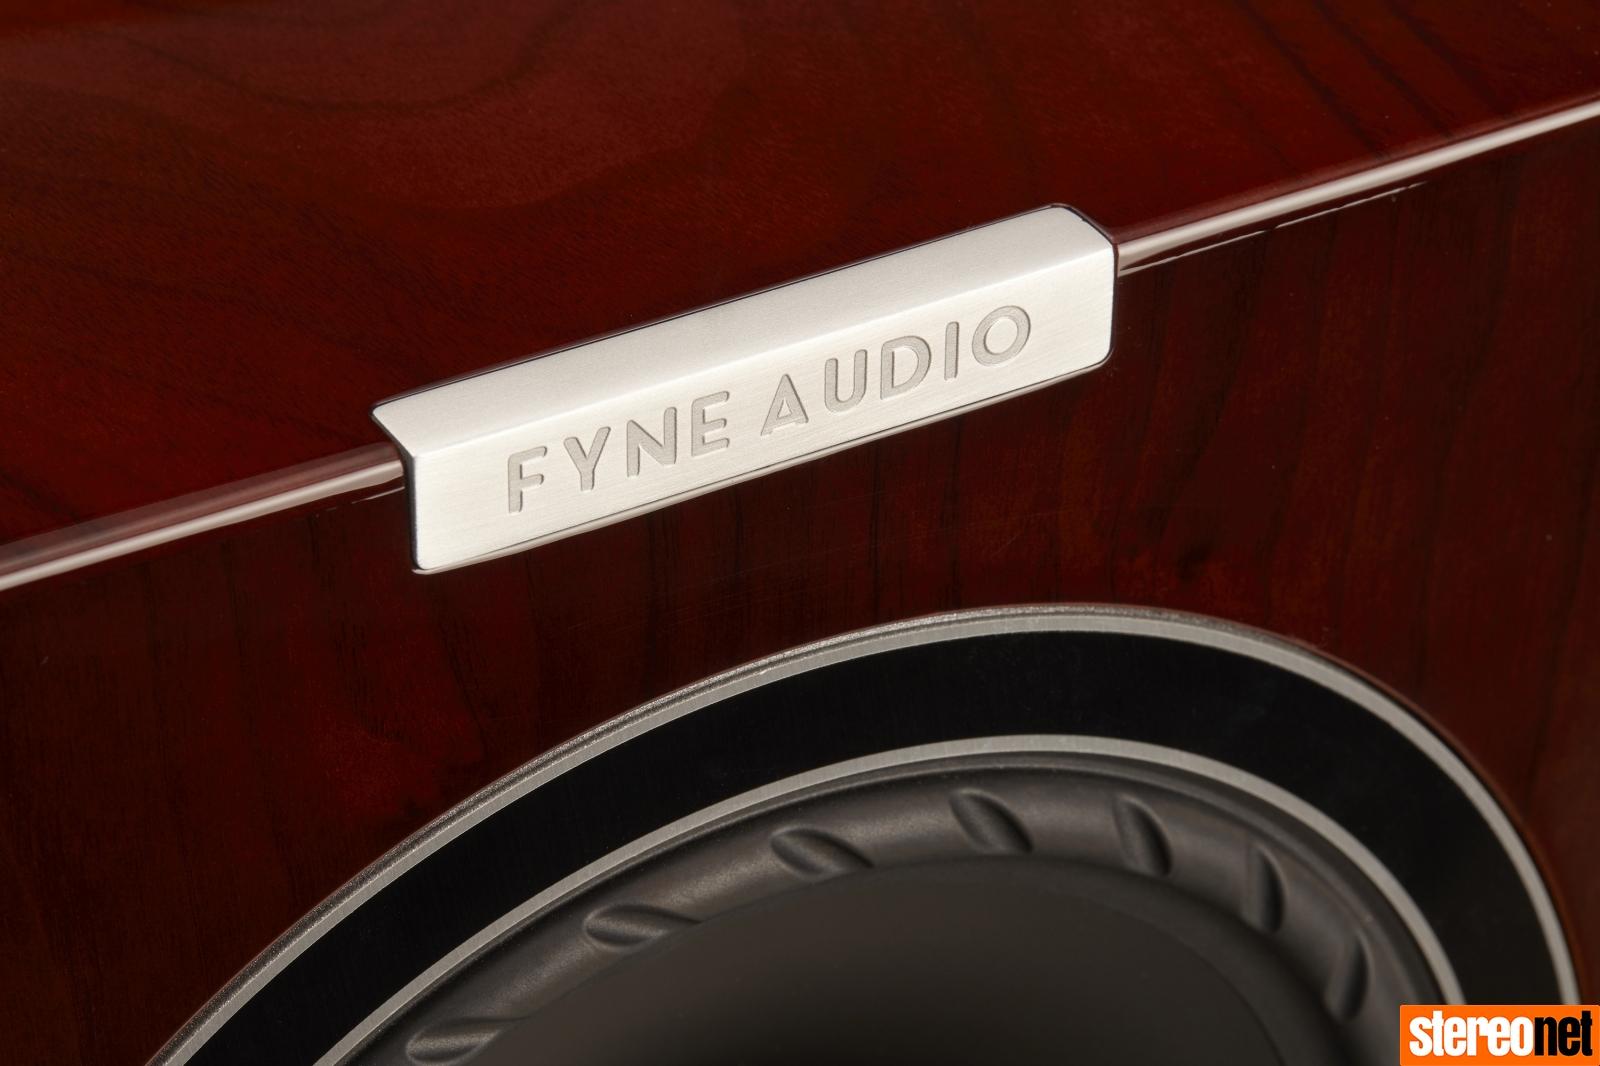 Fyne Audio USA